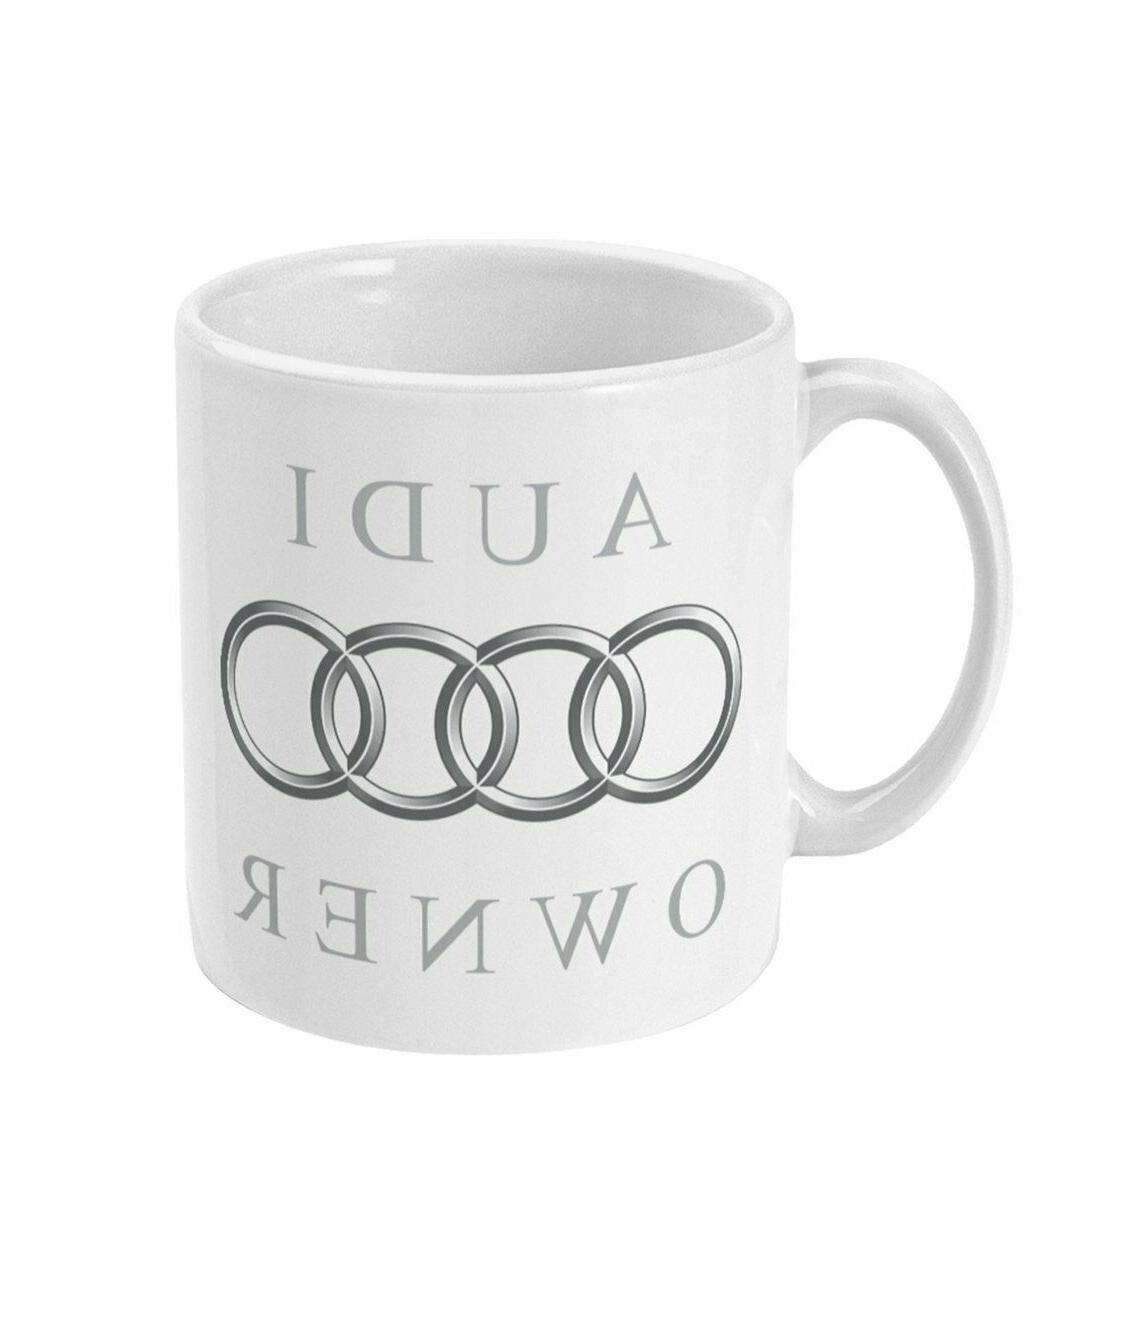 audi owner coffee tea drink mug ceramic